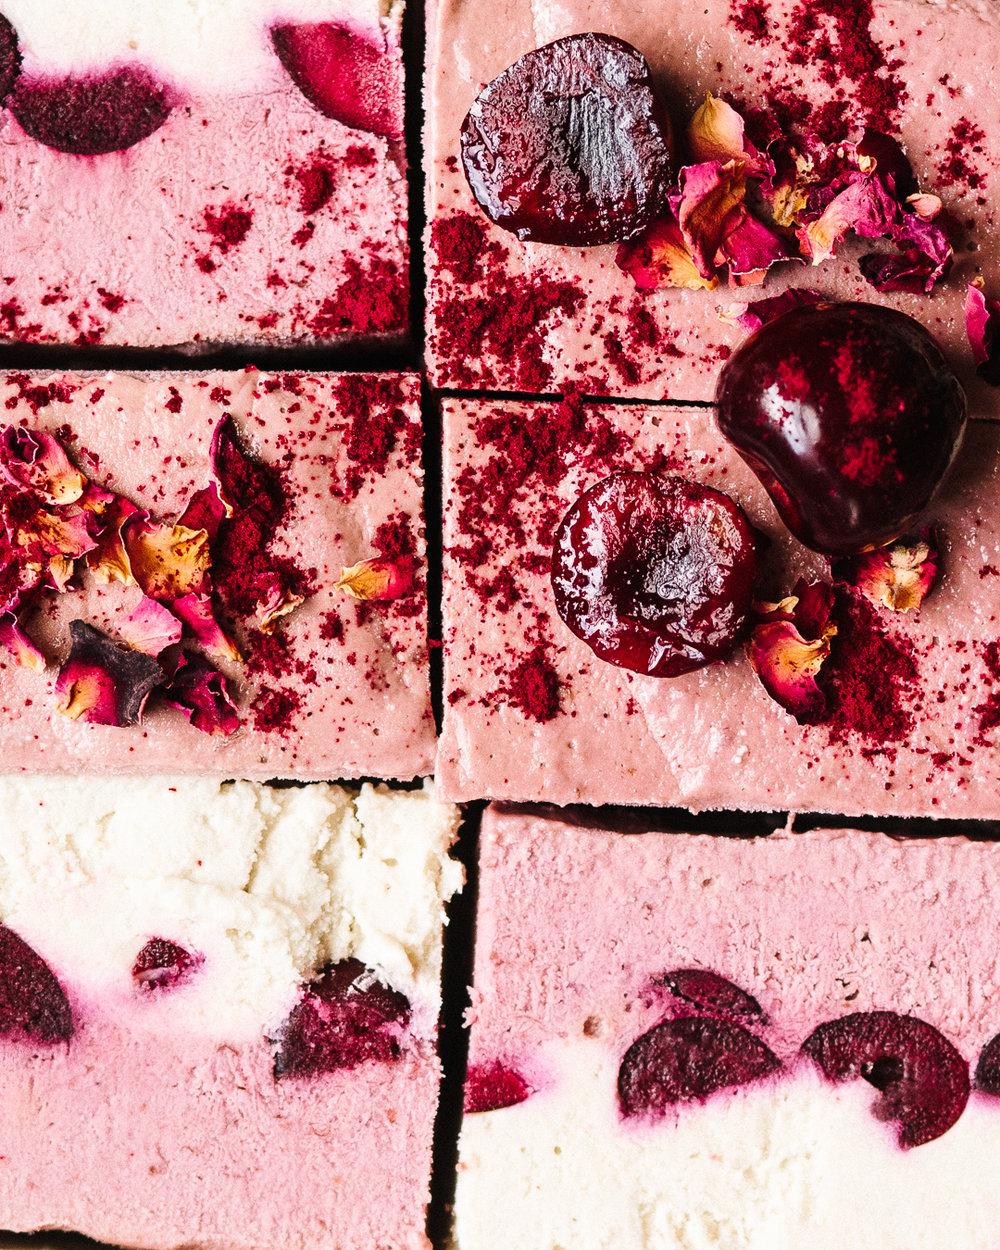 Cherry_and_Vanilla_Cheesecake_by_Jordan_Pie_Nutritionist_Photographer-1.jpg